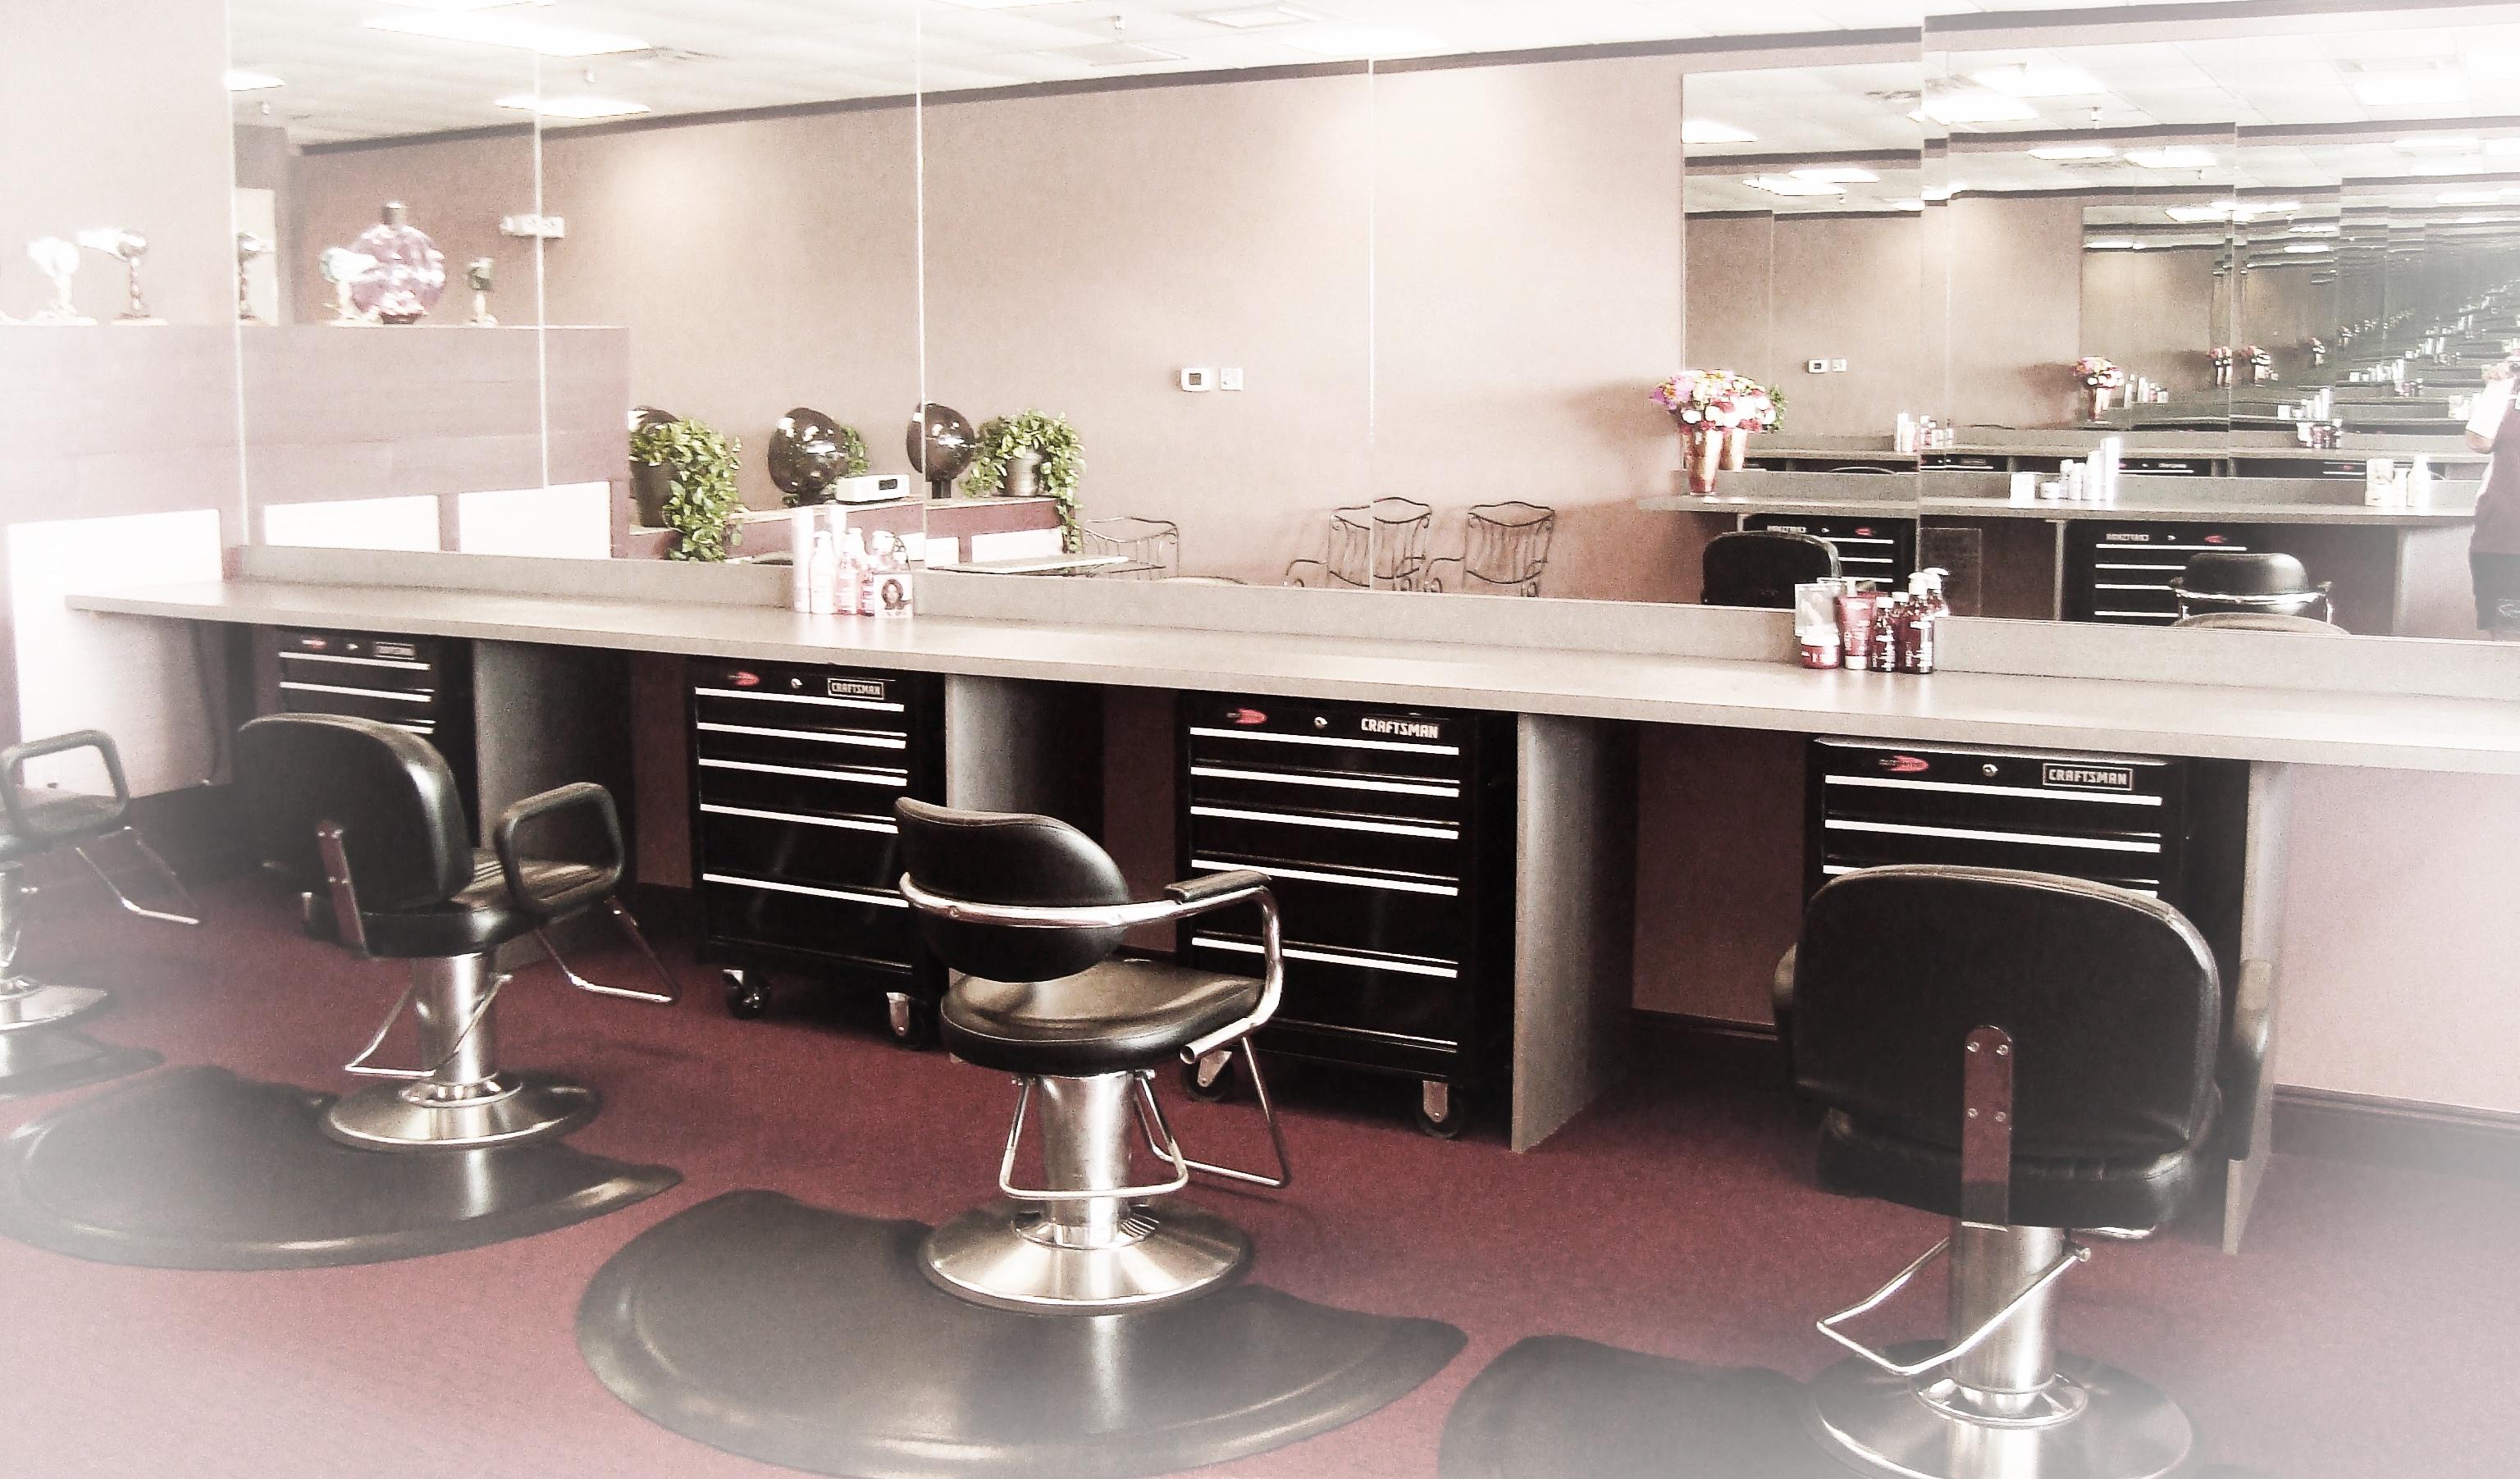 Inside Salon Salon in Destin